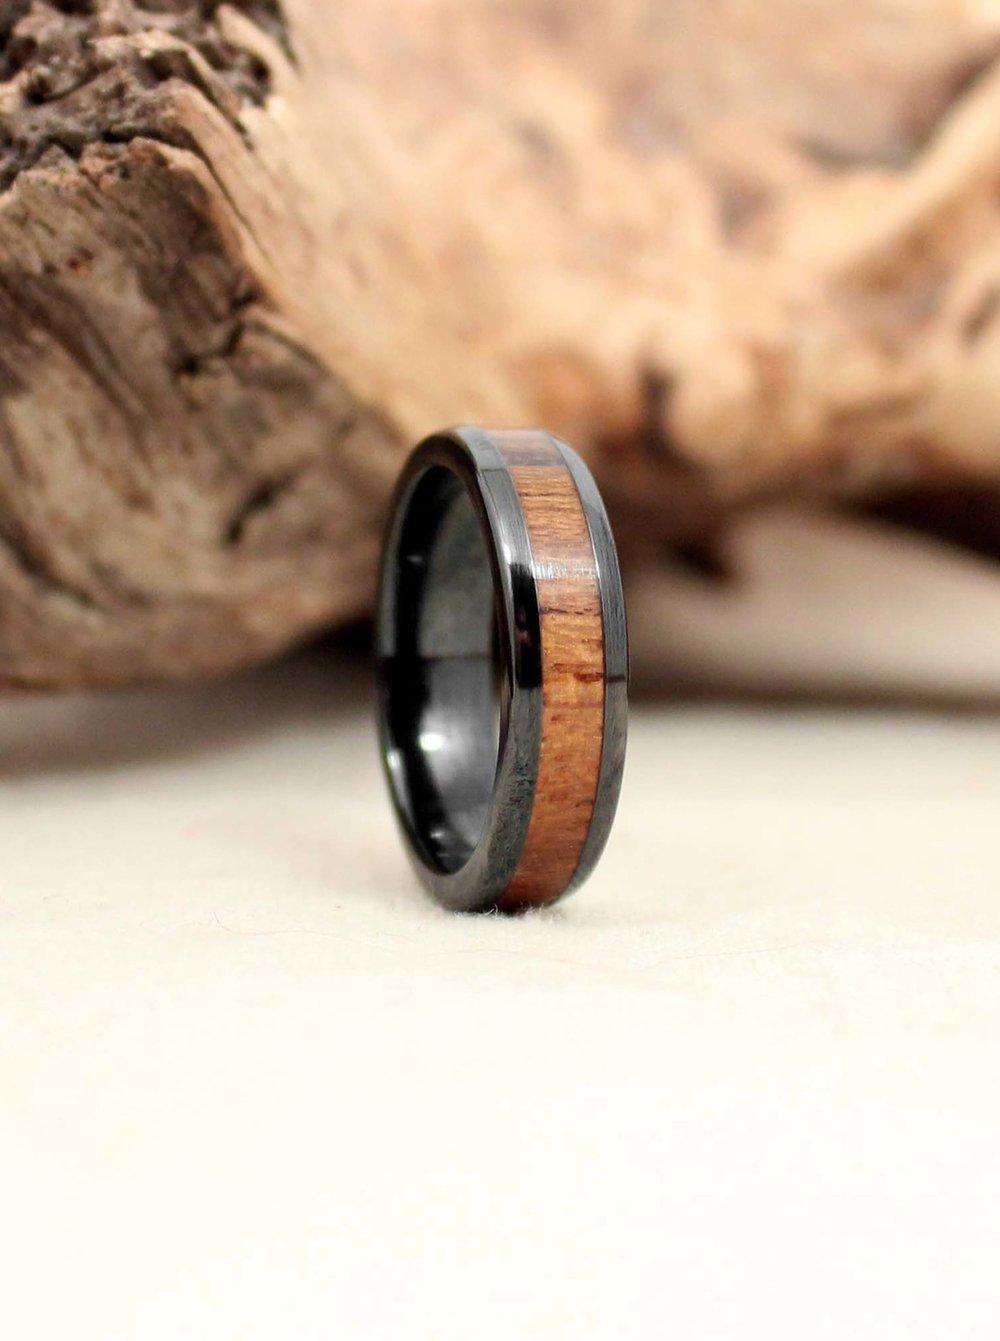 USS North Carolina Deck Teak and Black Ceramic Wooden Ring